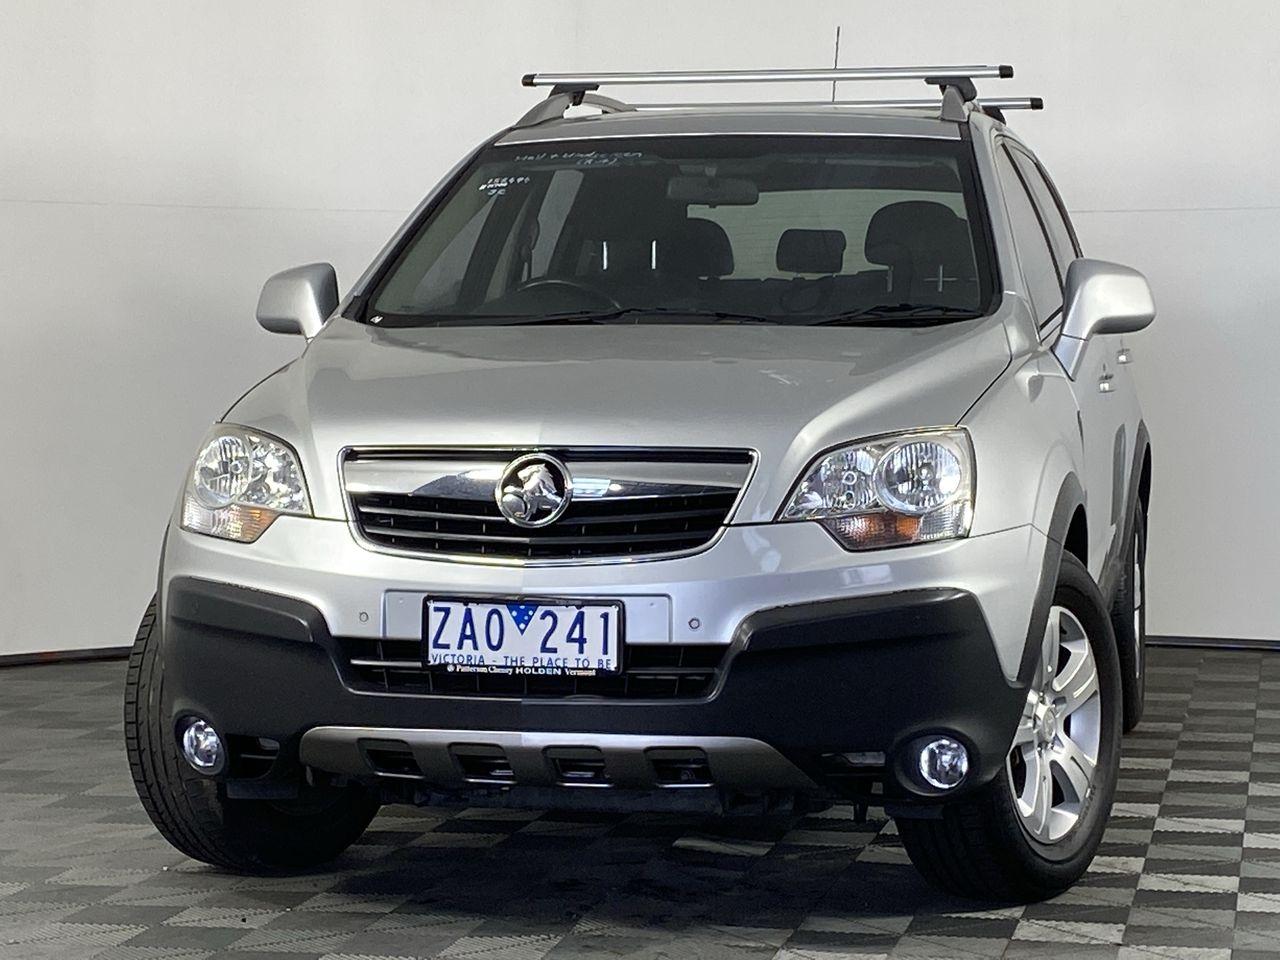 2010 Holden Captiva 5 (4x4) CG Automatic Wagon